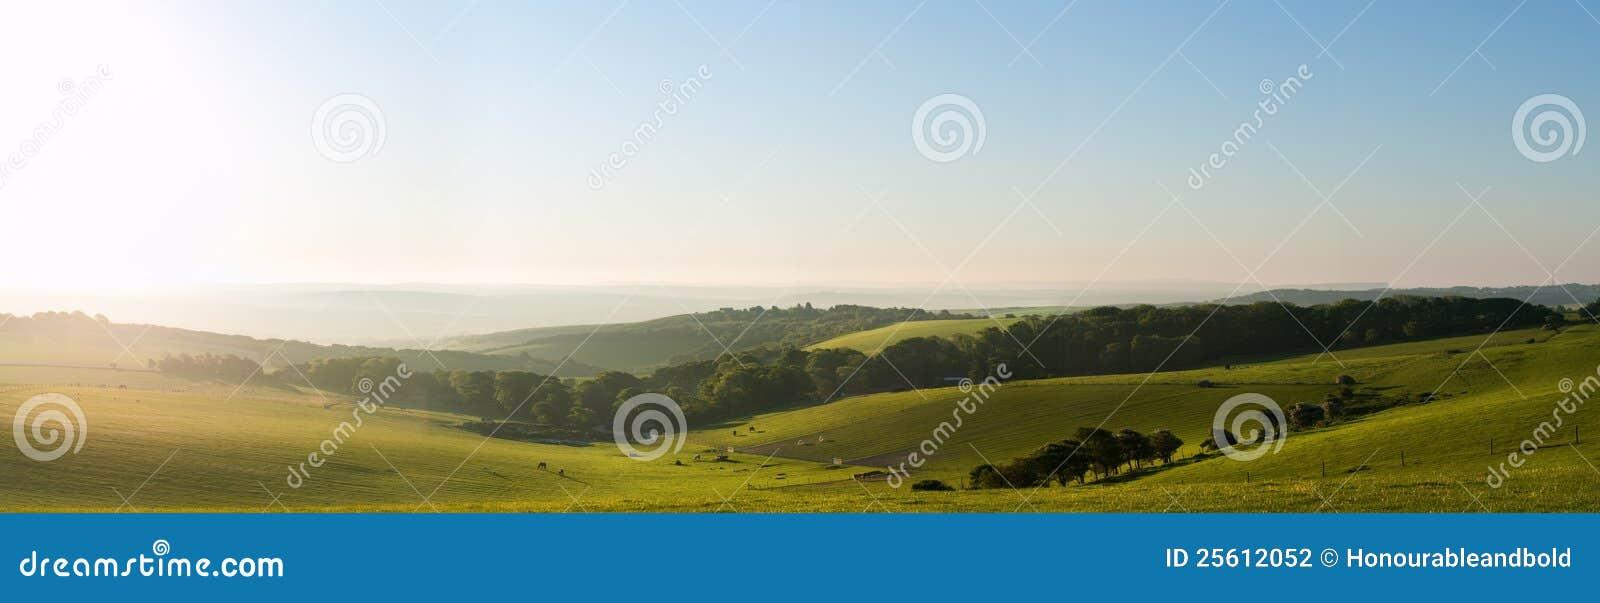 Summer sunrise over English countryside landscape